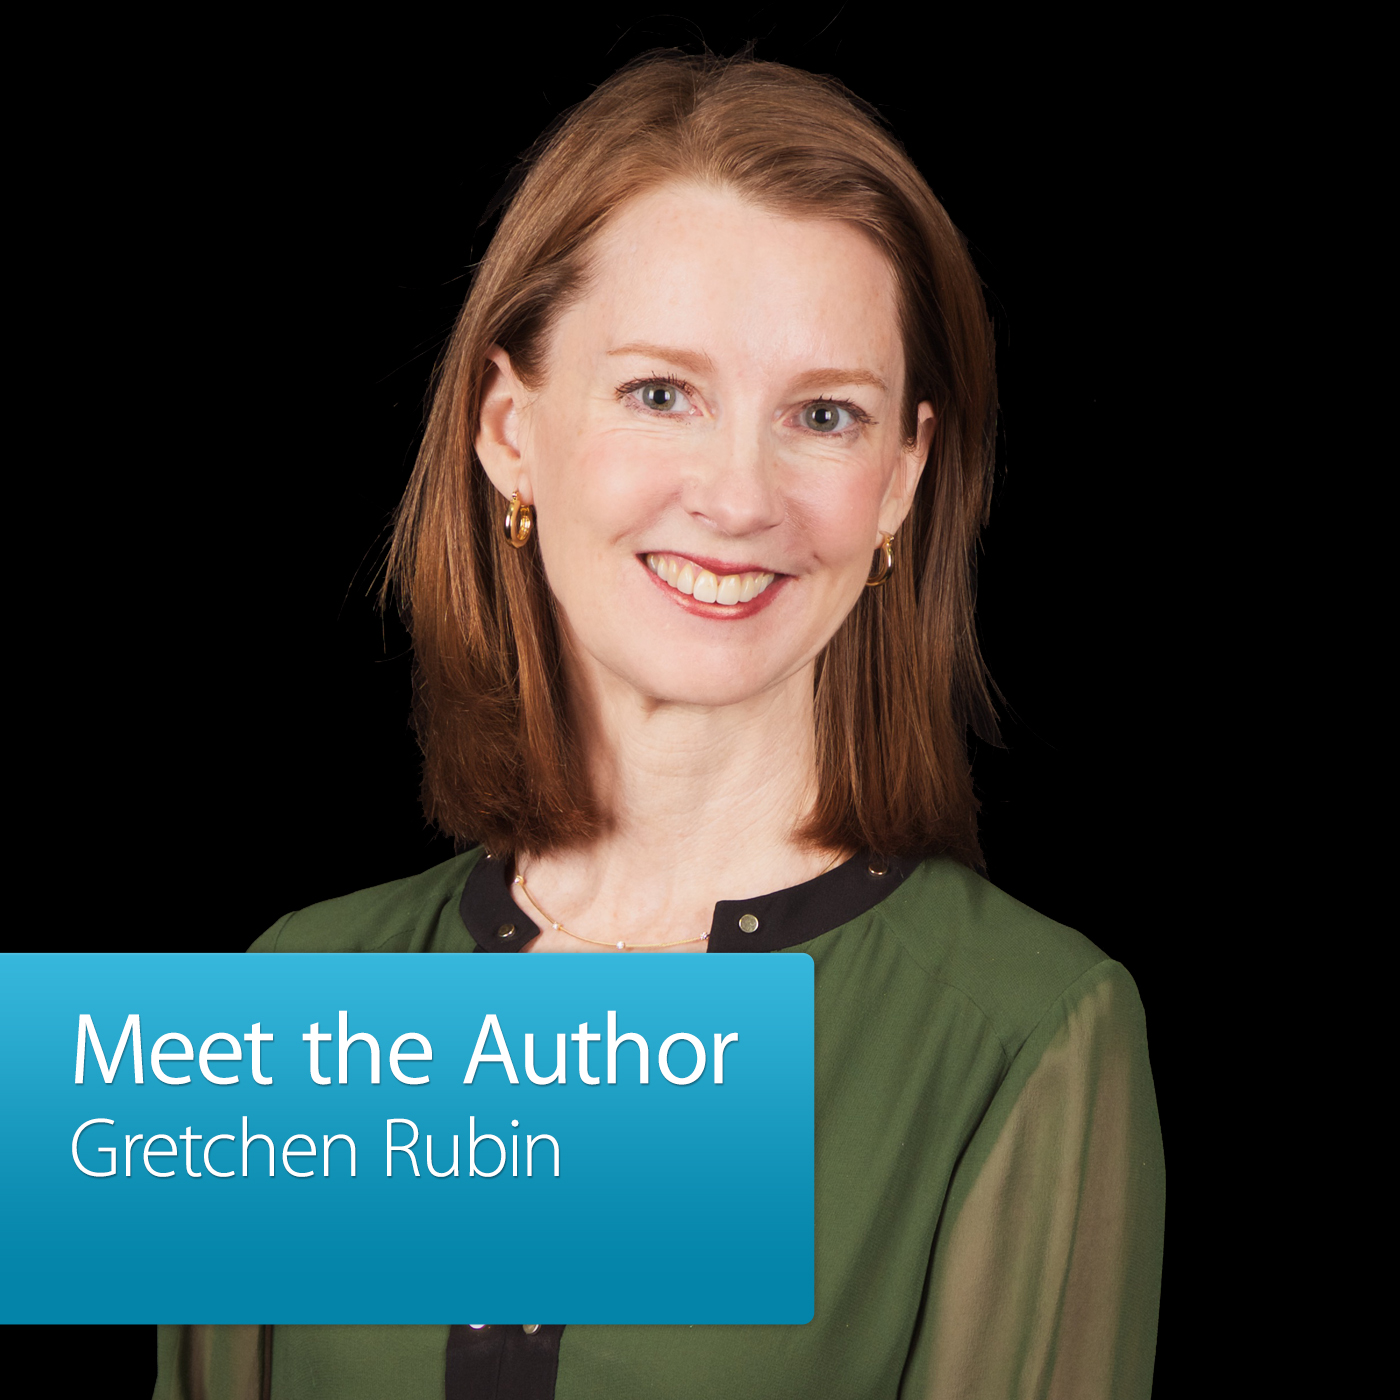 Gretchen Rubin: Meet the Author